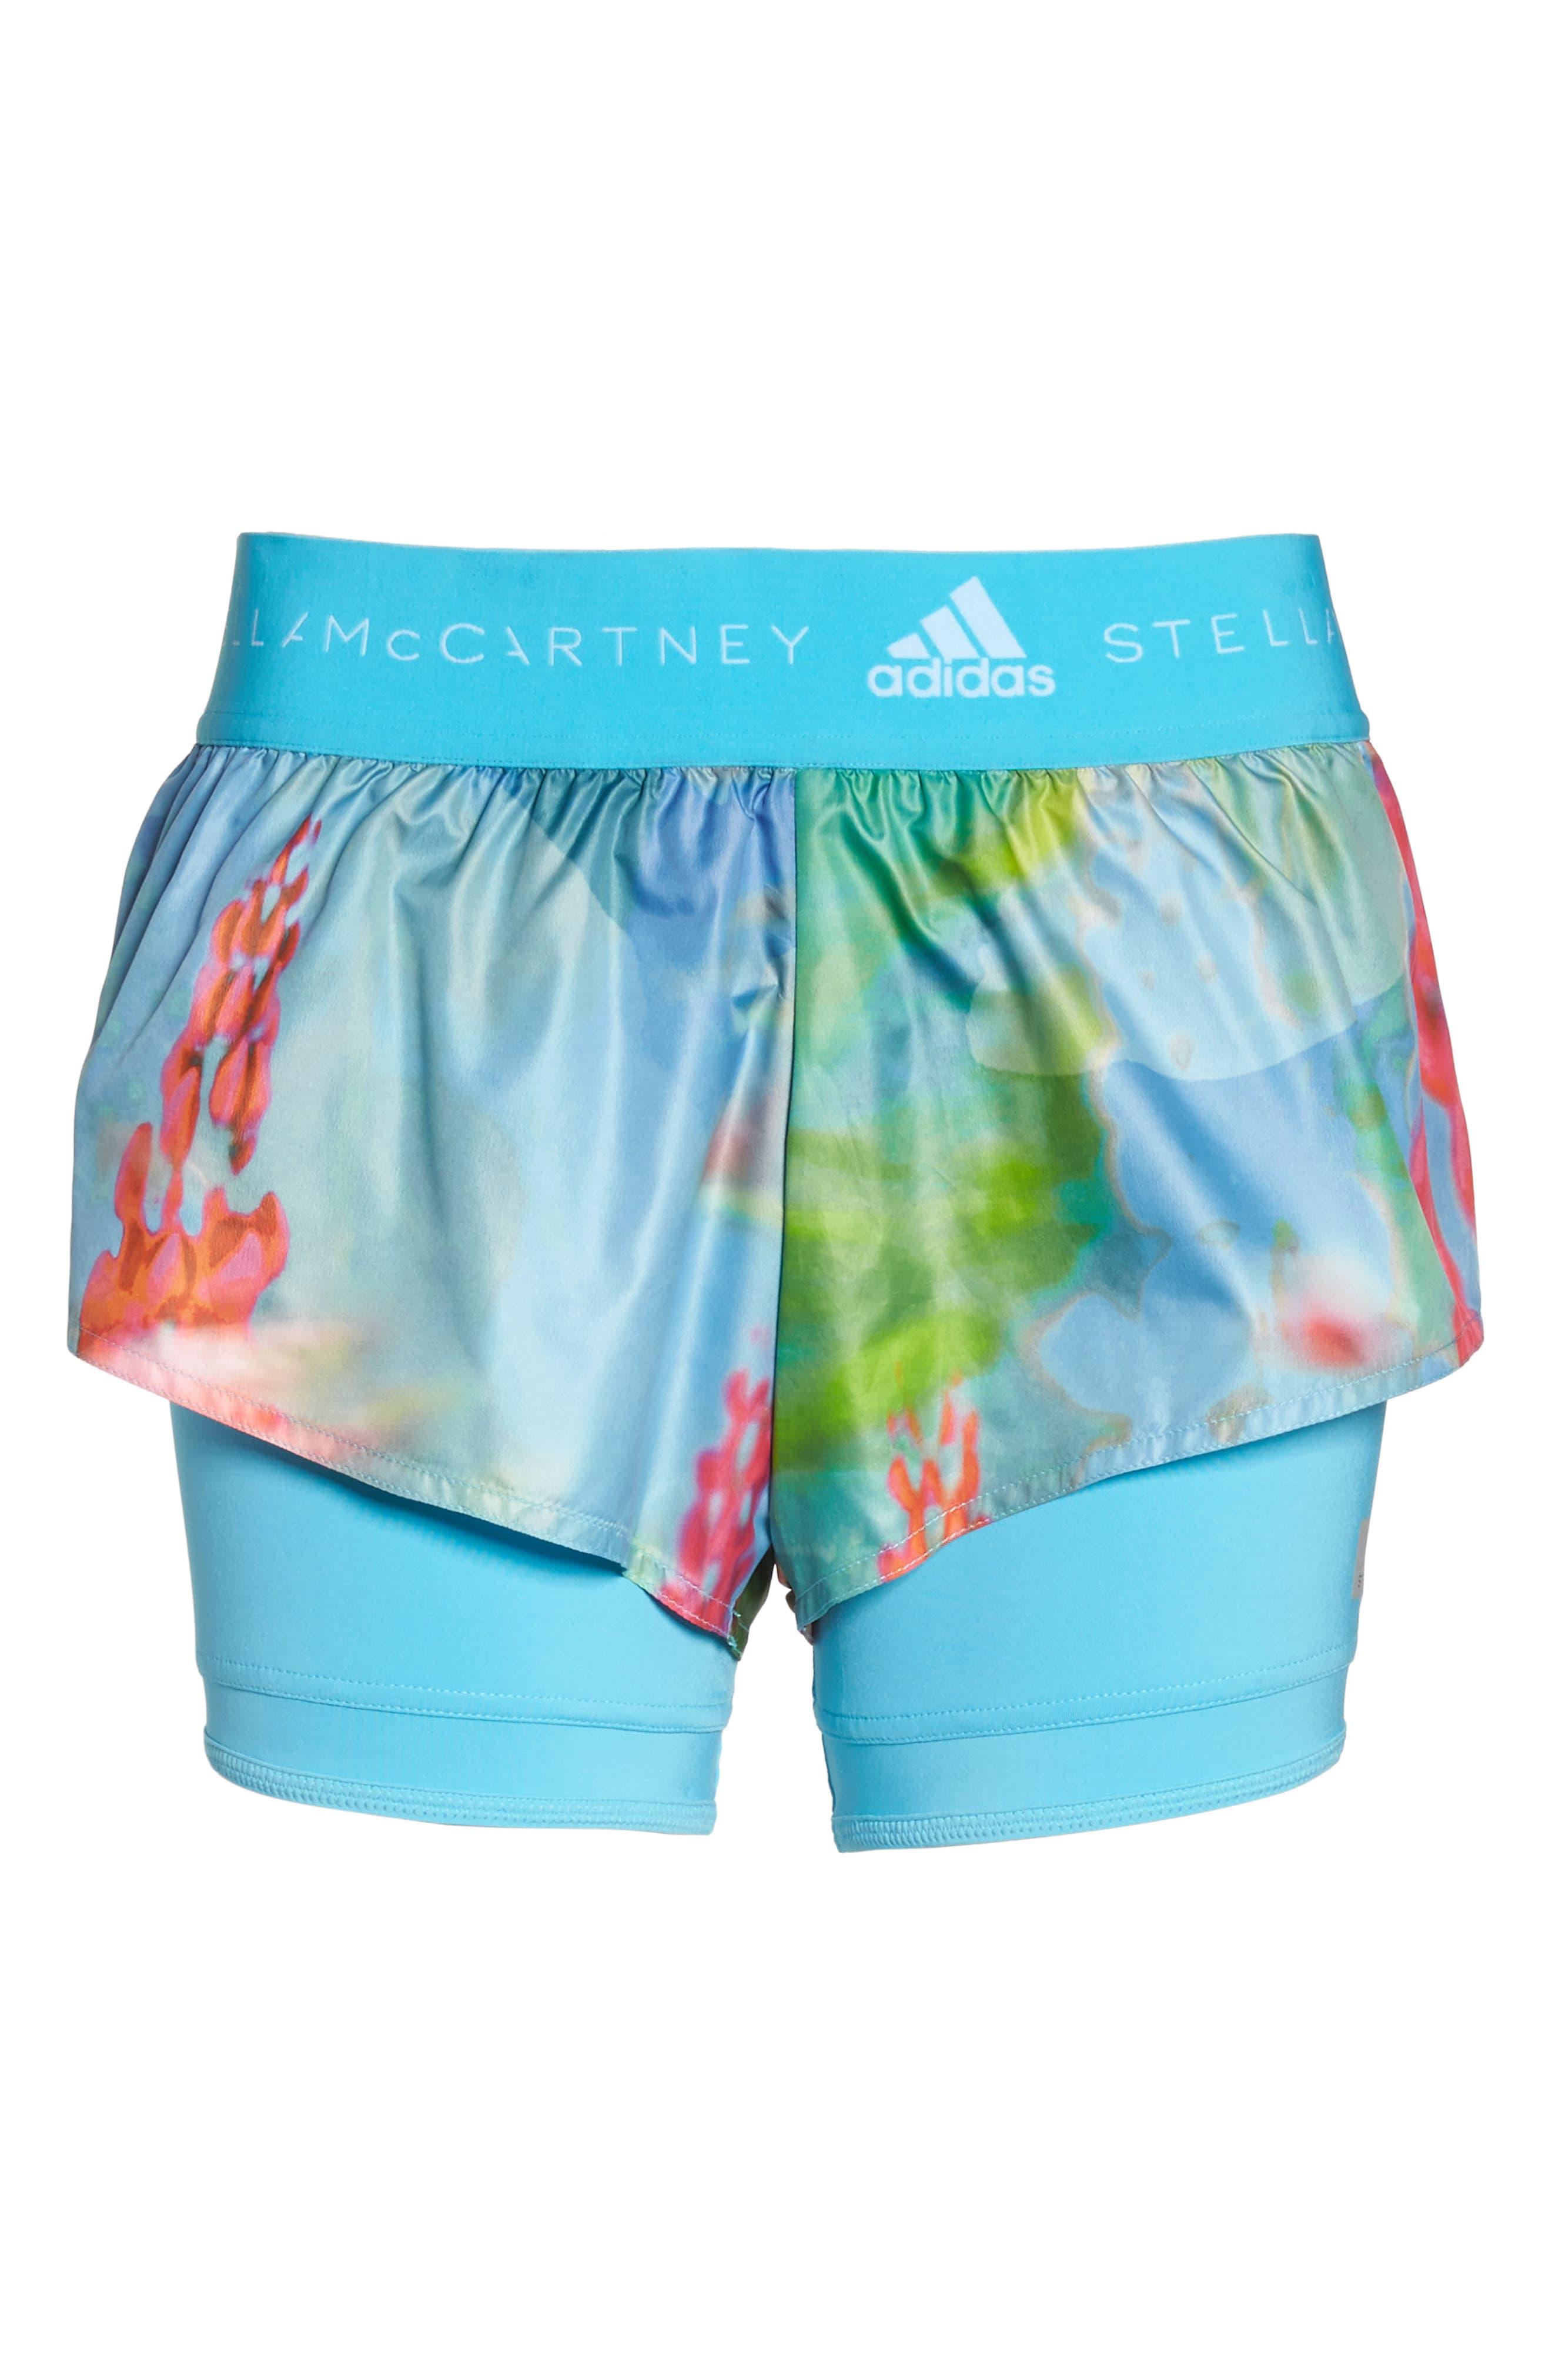 2-in-1 Run Shorts,                             Alternate thumbnail 7, color,                             Mirror Blue-Smc/ Multicolor